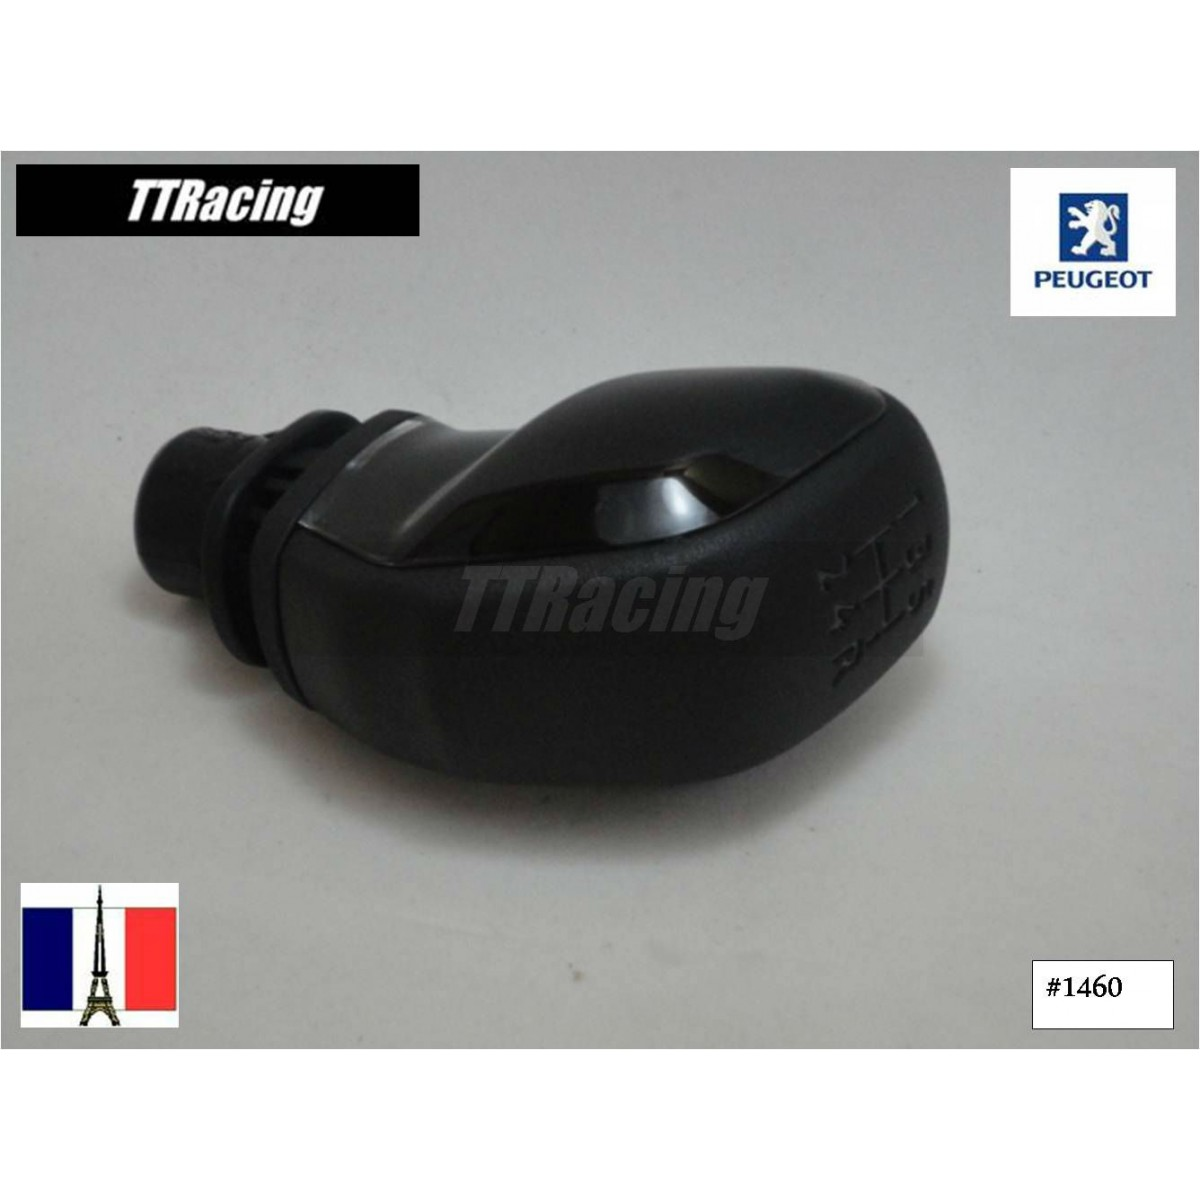 Manopla de câmbio PEUGEOT 208 ORIGINAL - Made in France  - T & T Soluções